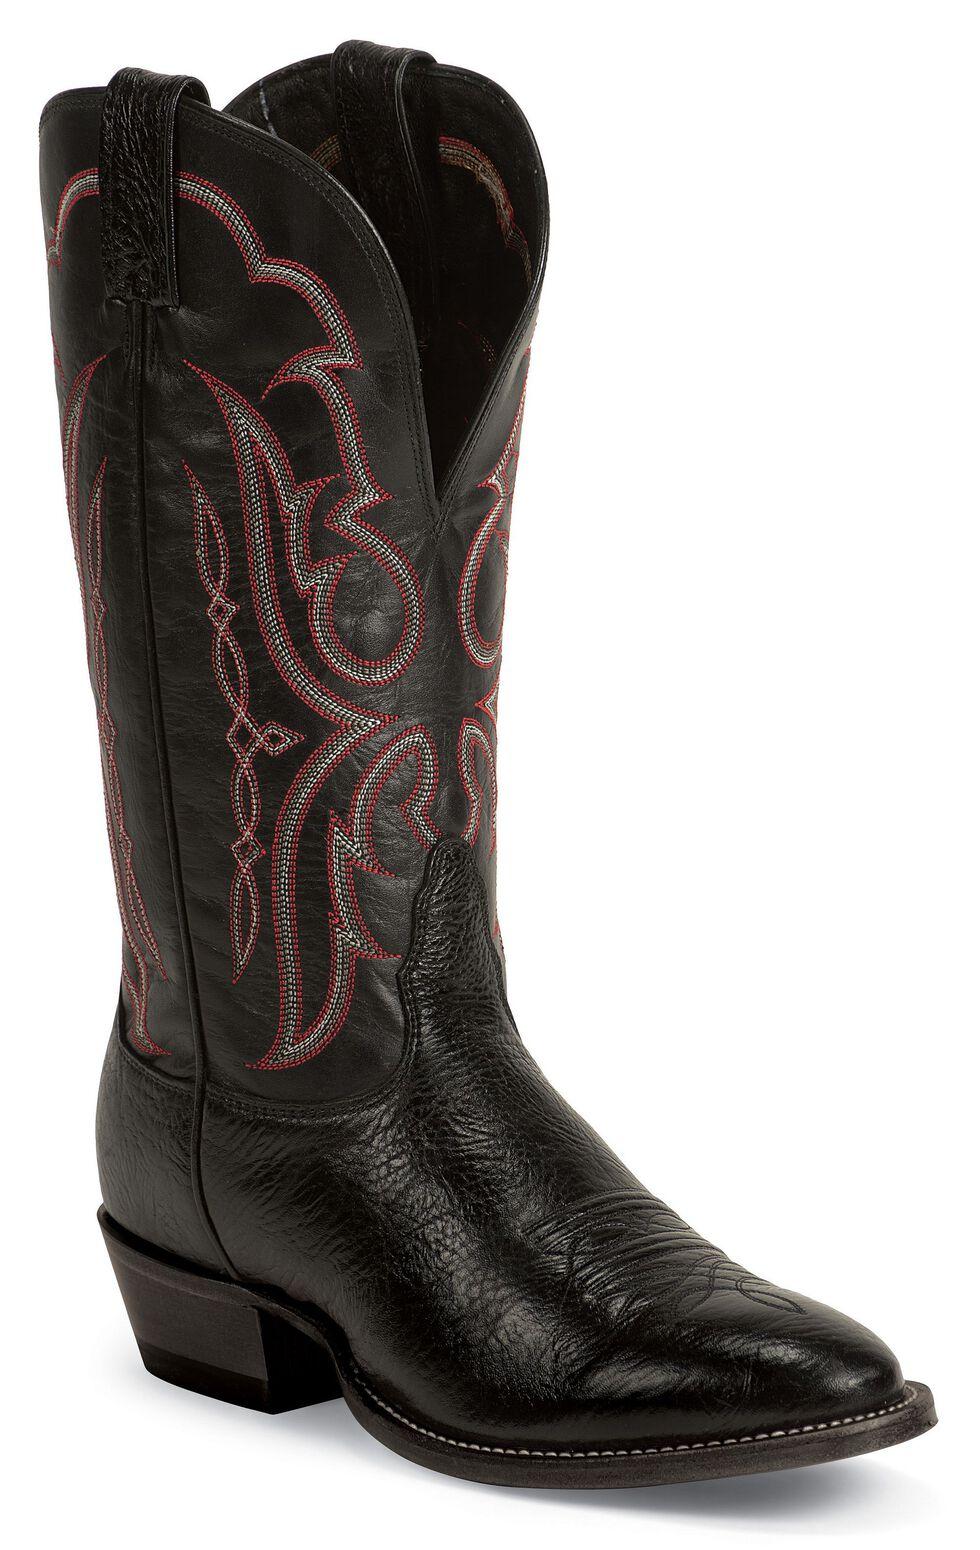 Nocona Bull Shoulder Western Cowboy Boots - Wide Round Toe, Black, hi-res